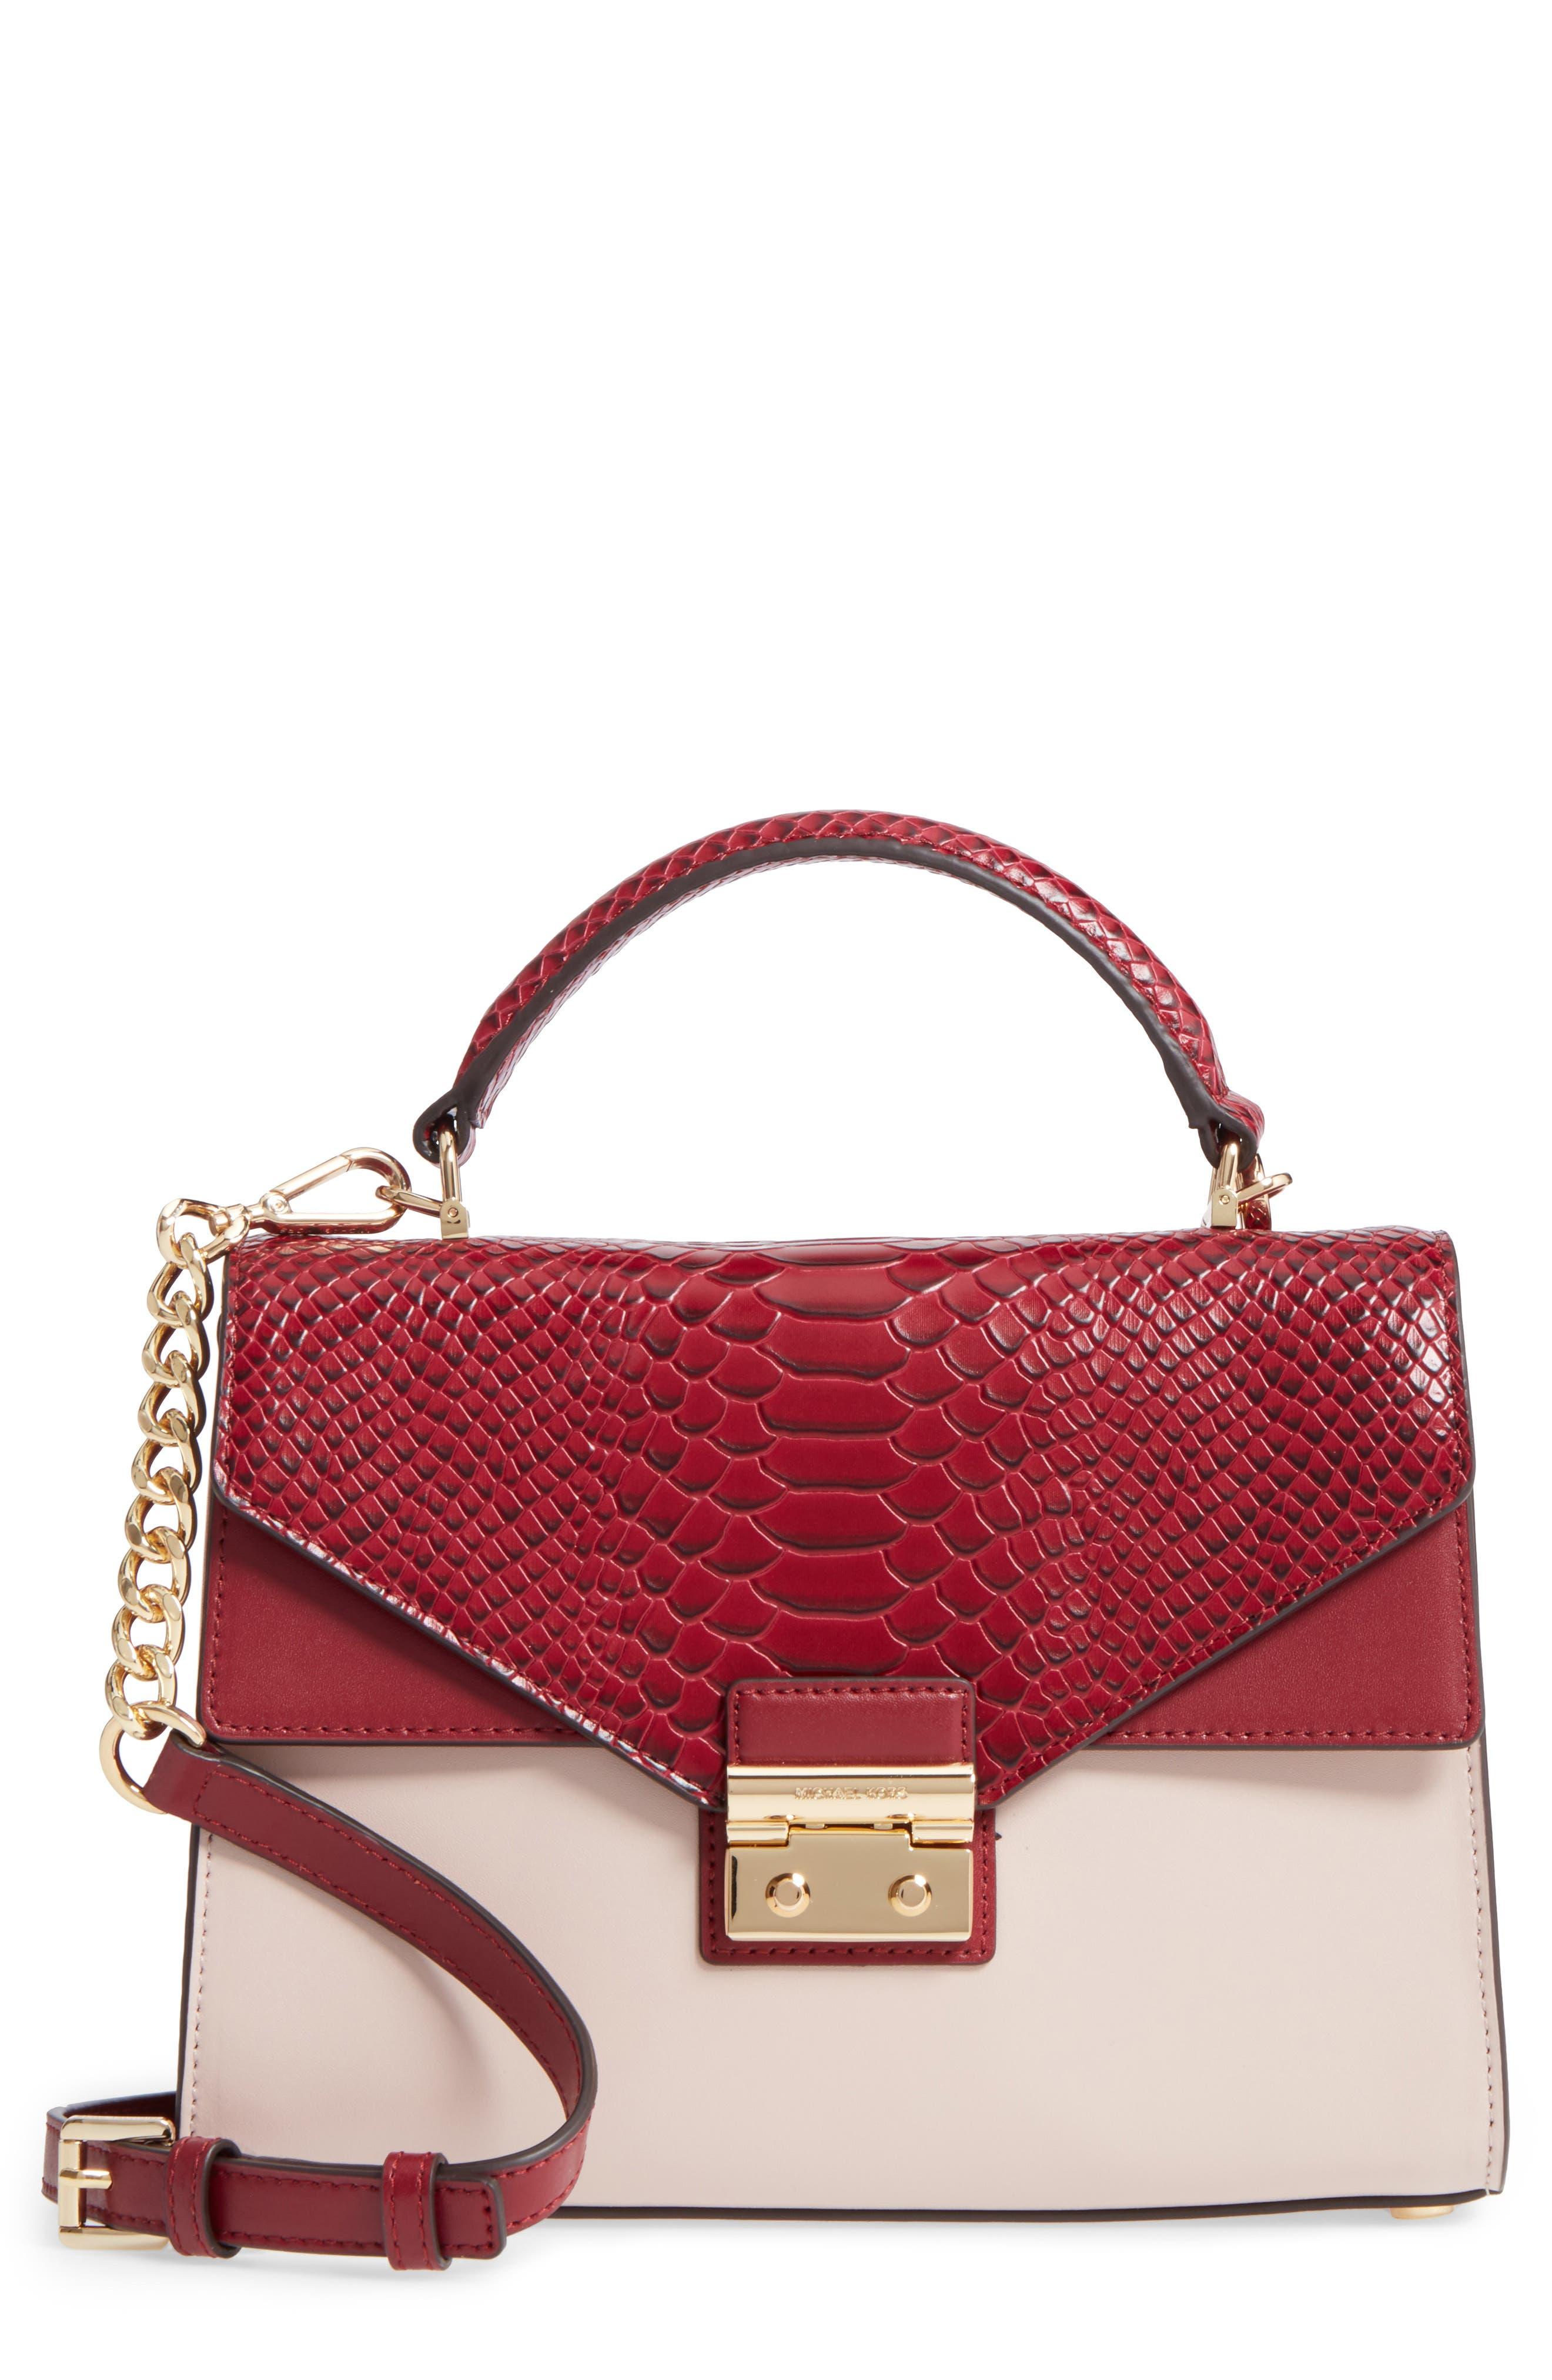 Alternate Image 1 Selected - MICHAEL Michael Kors Medium Sloan Leather Shoulder Bag